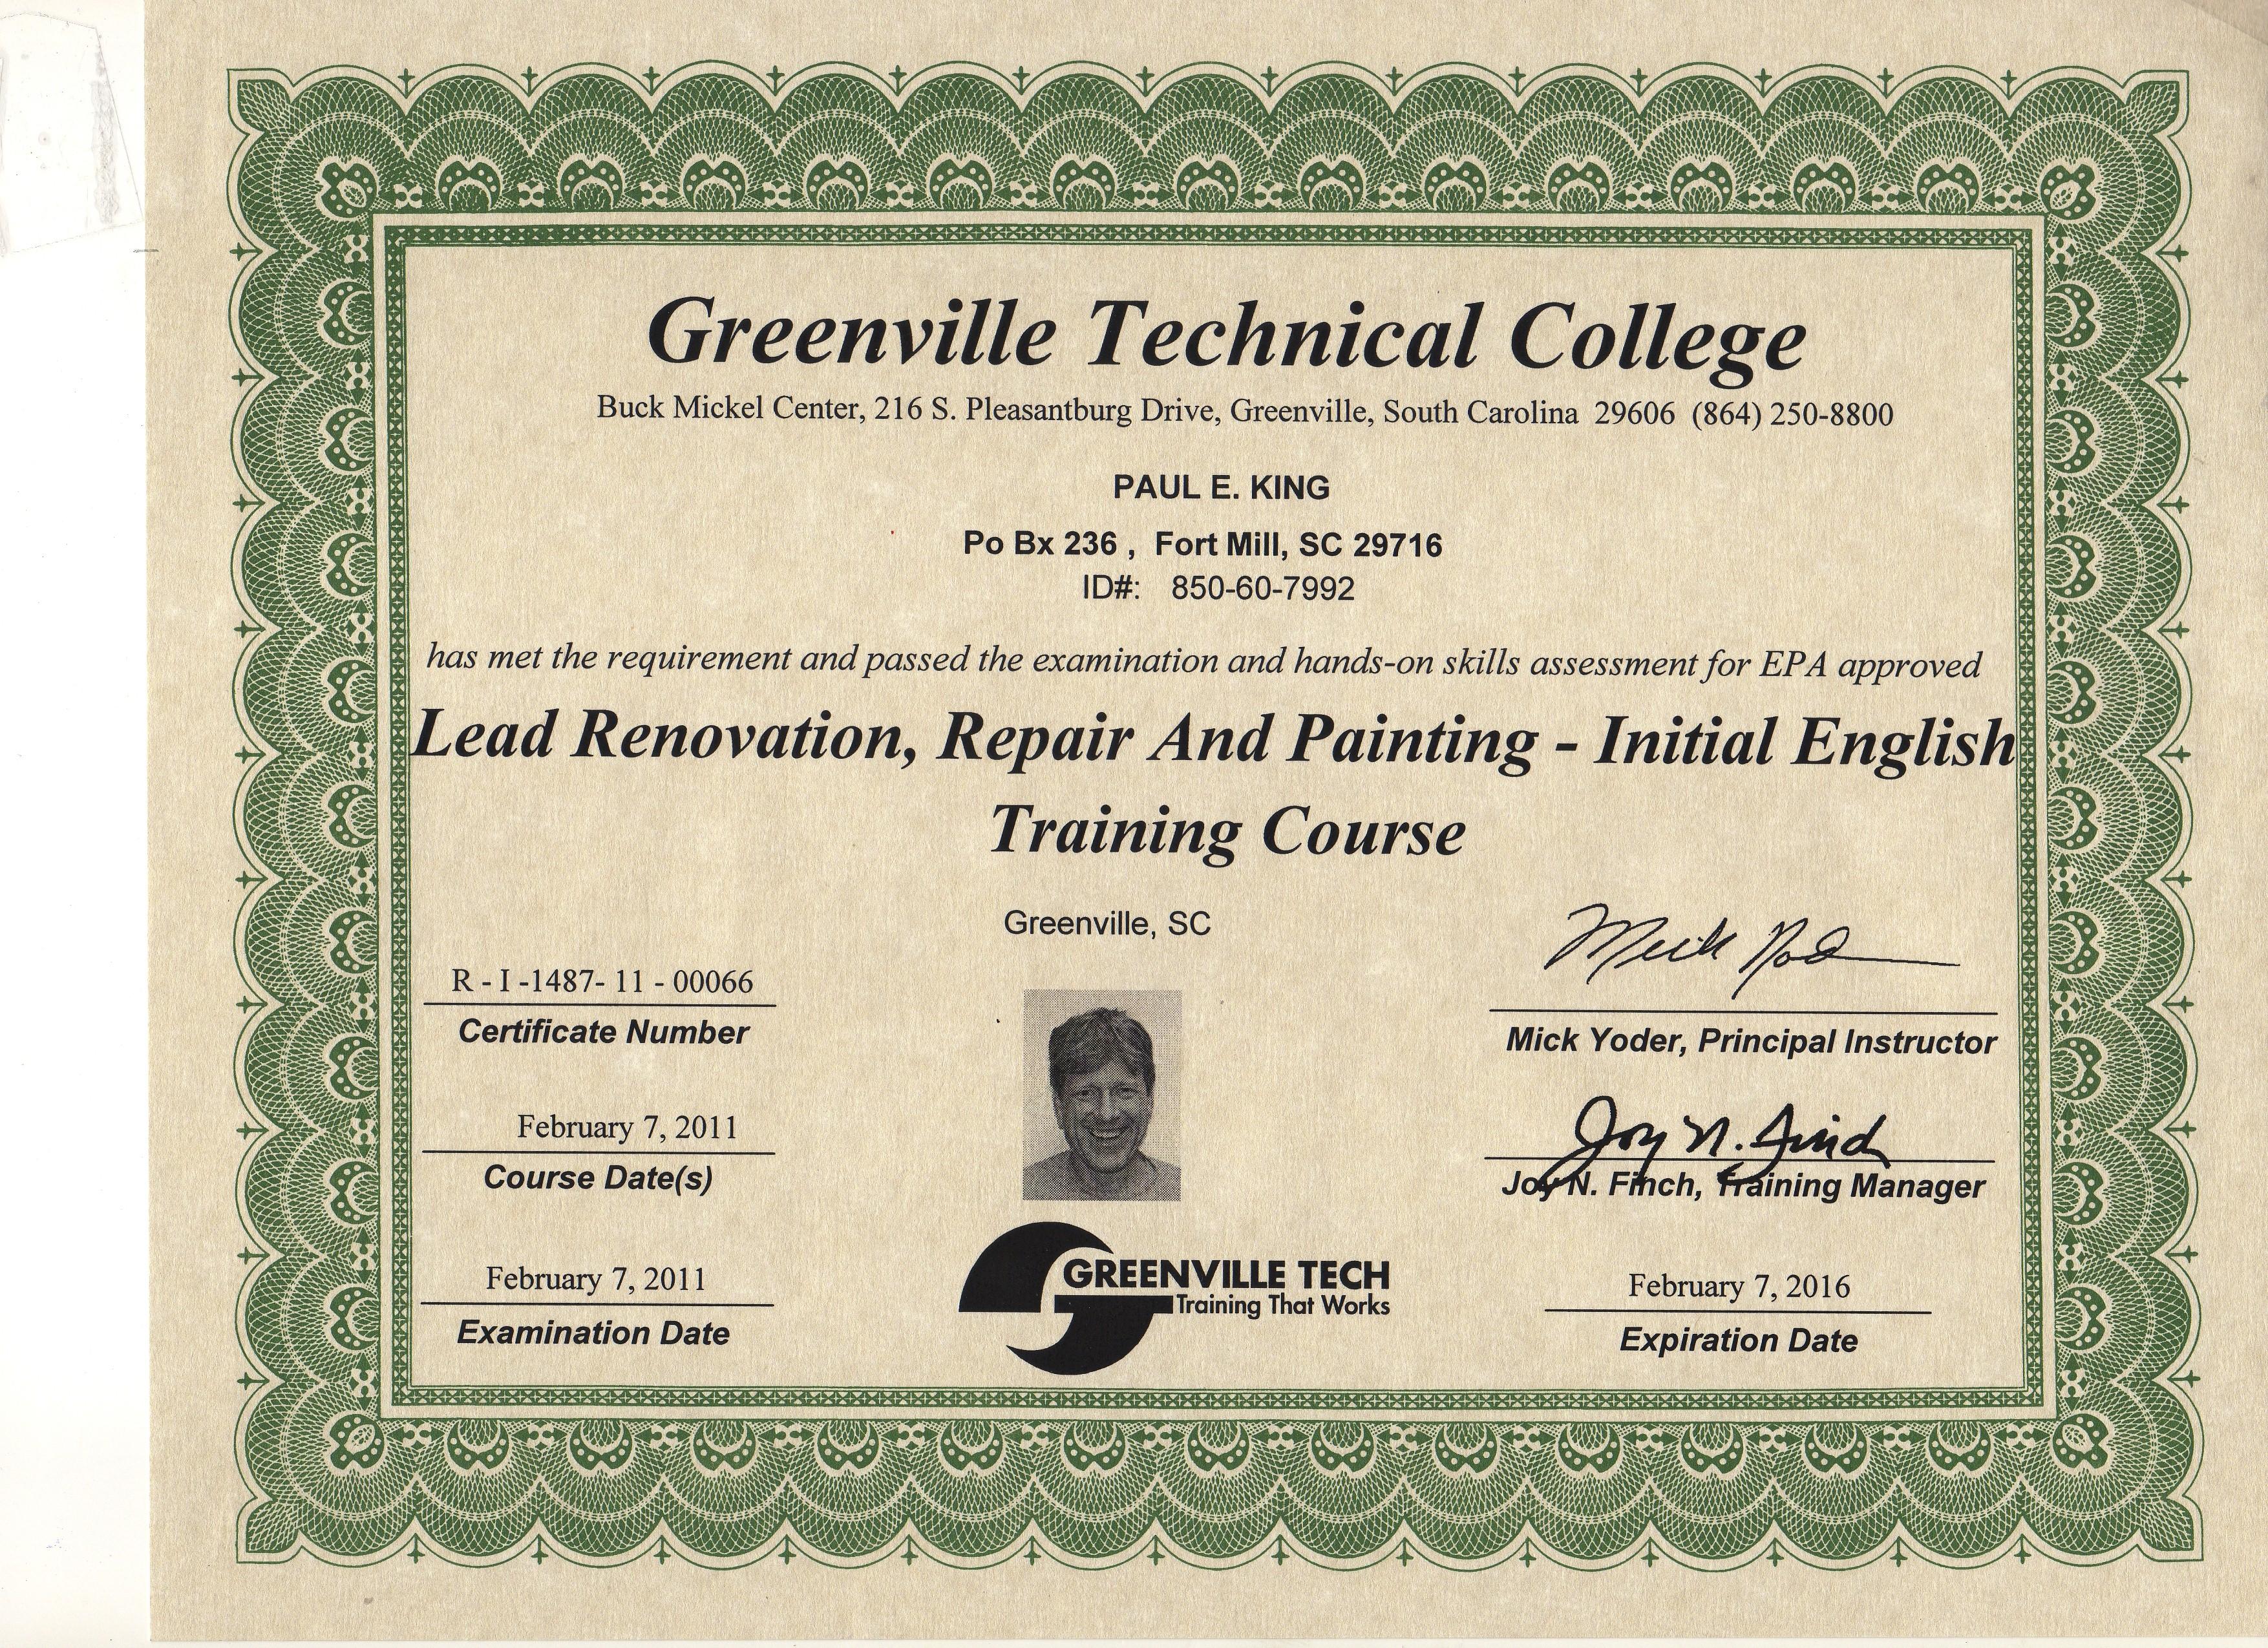 Birth Certificate Bridgeport Ct Free Professional Resume